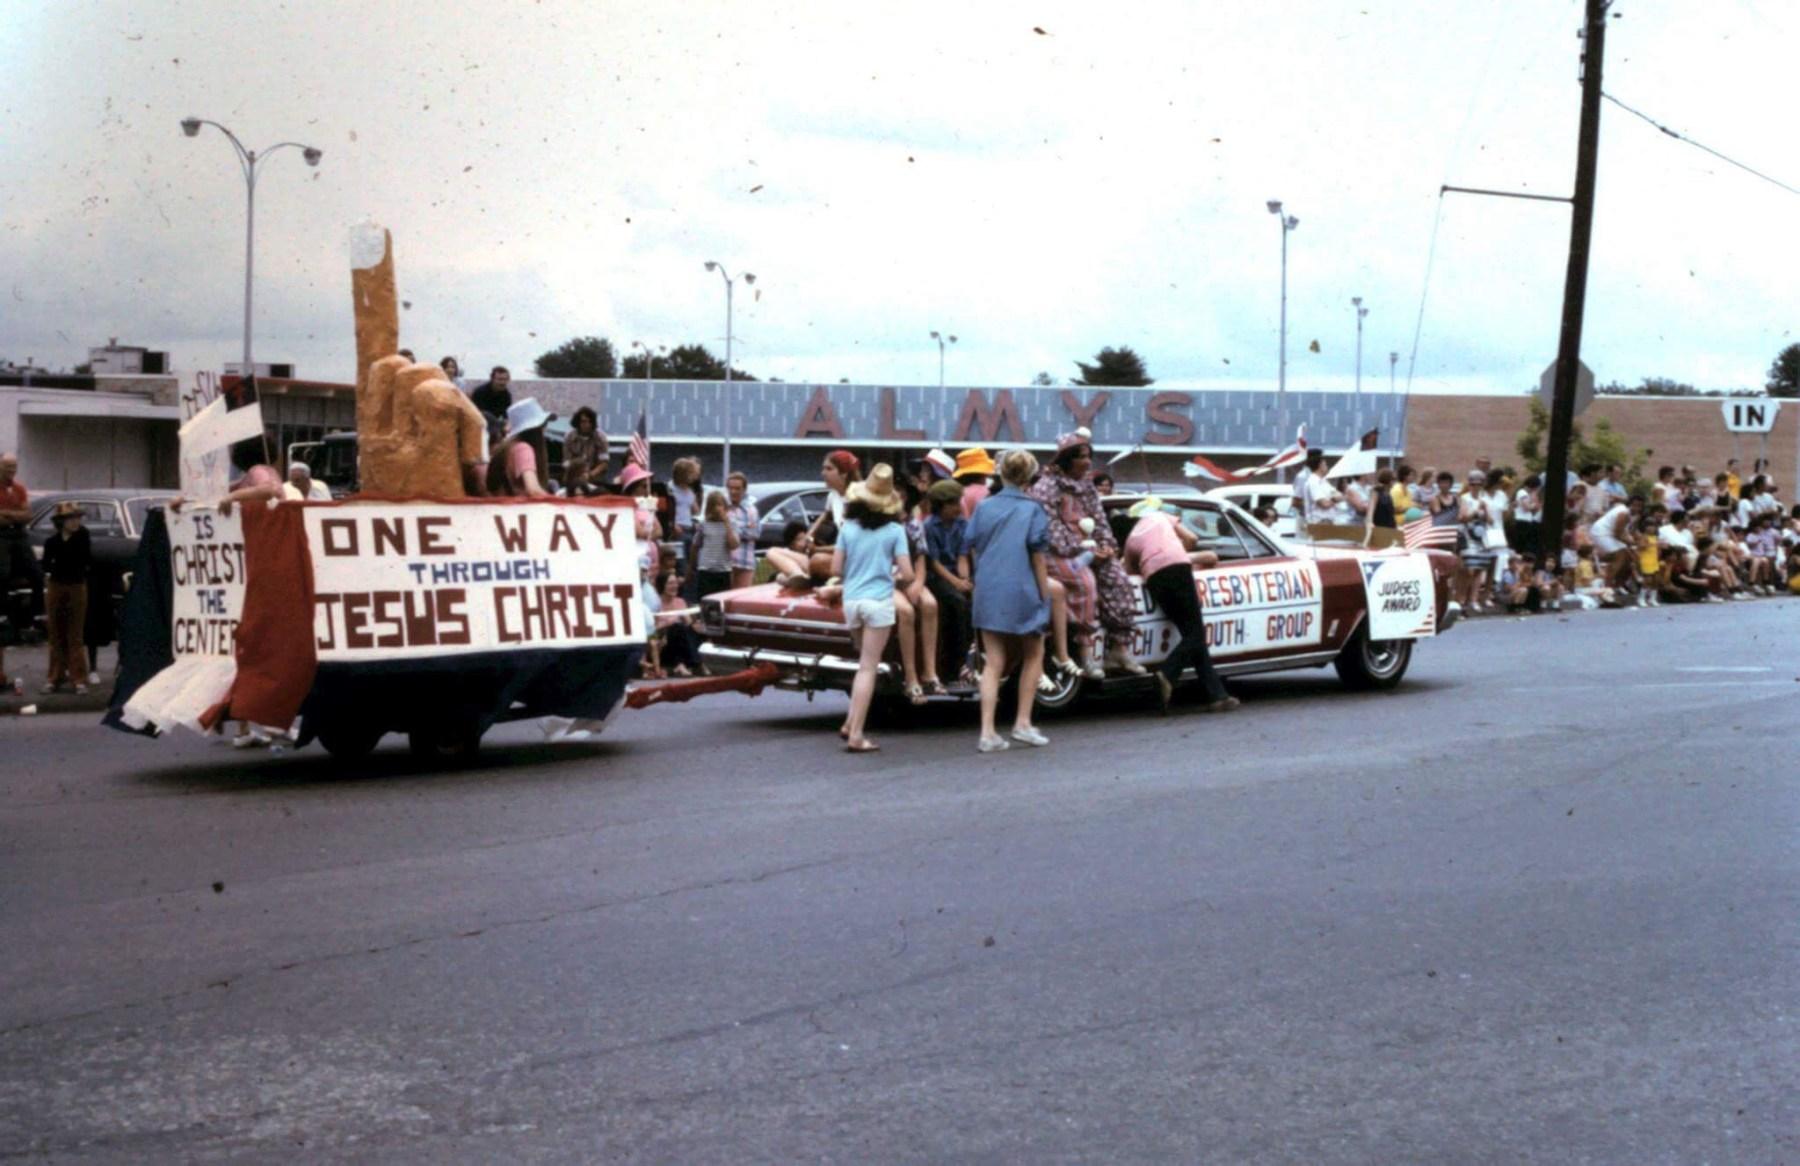 Presbyterian Church parade float 3